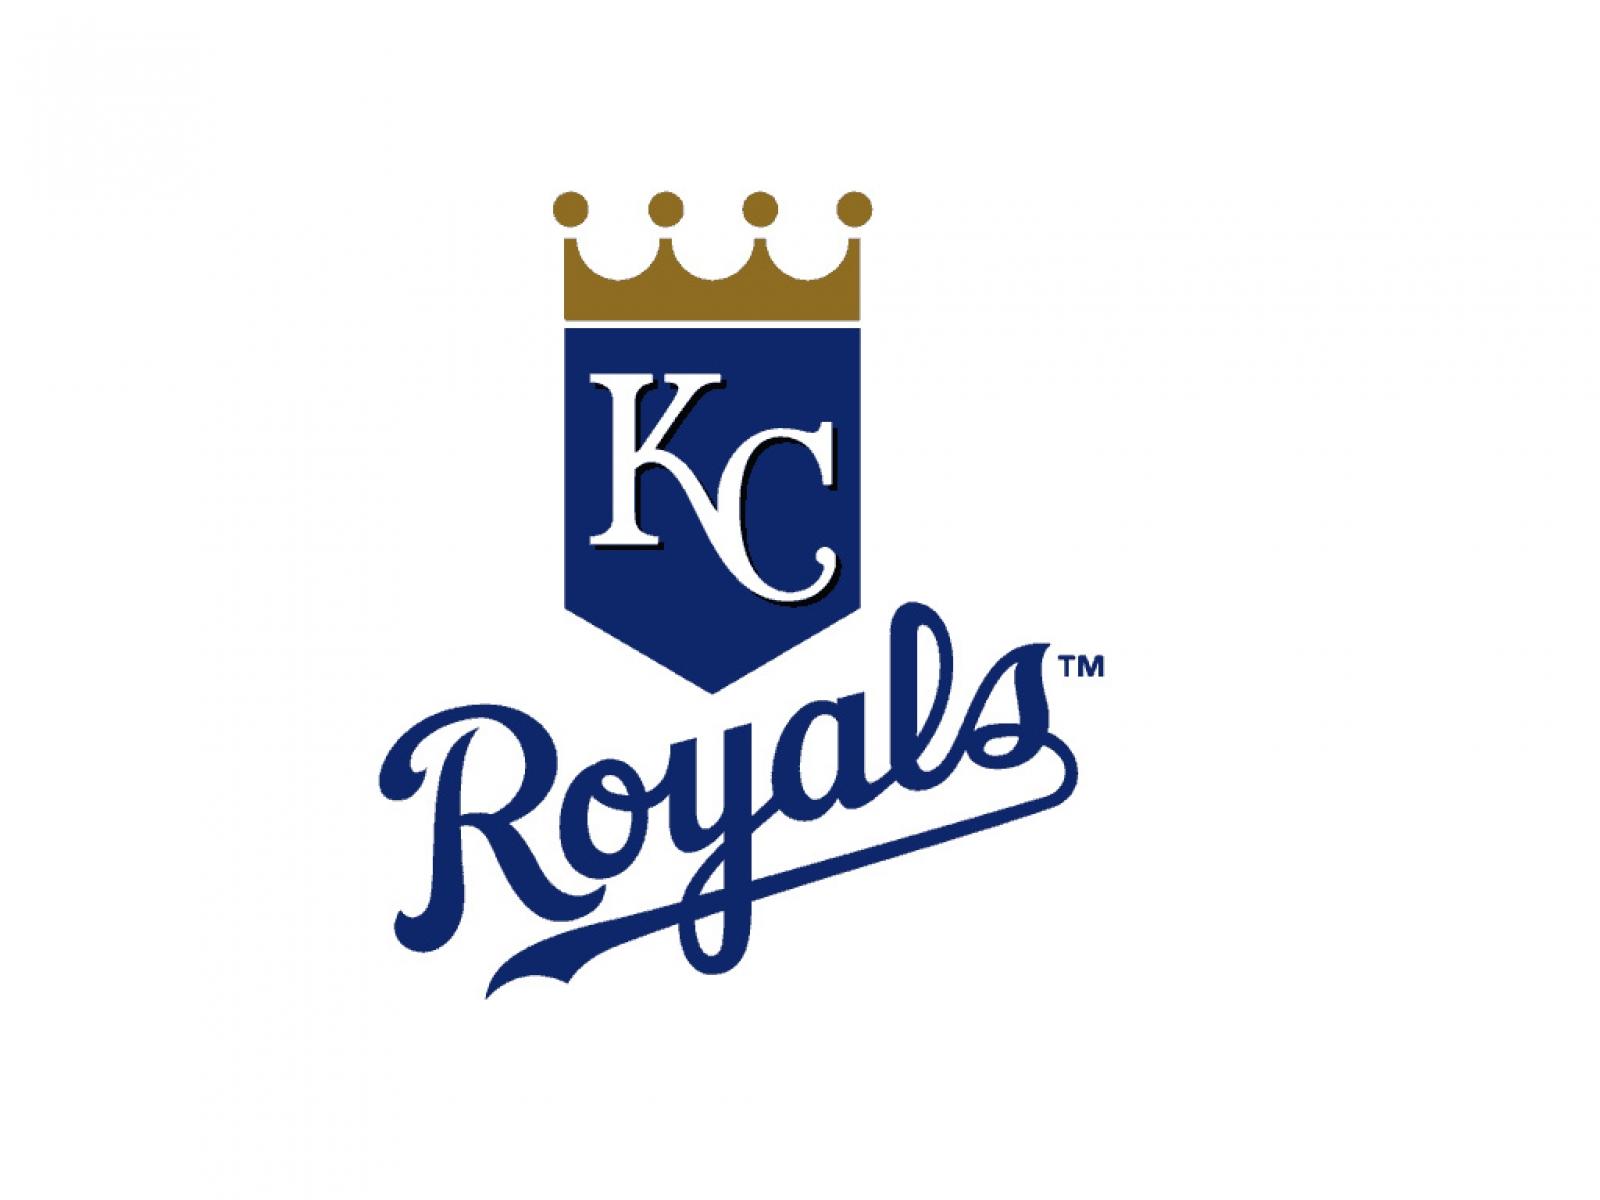 KANSAS CITY ROYALS mlb baseball 10 wallpaper background 1600x1200